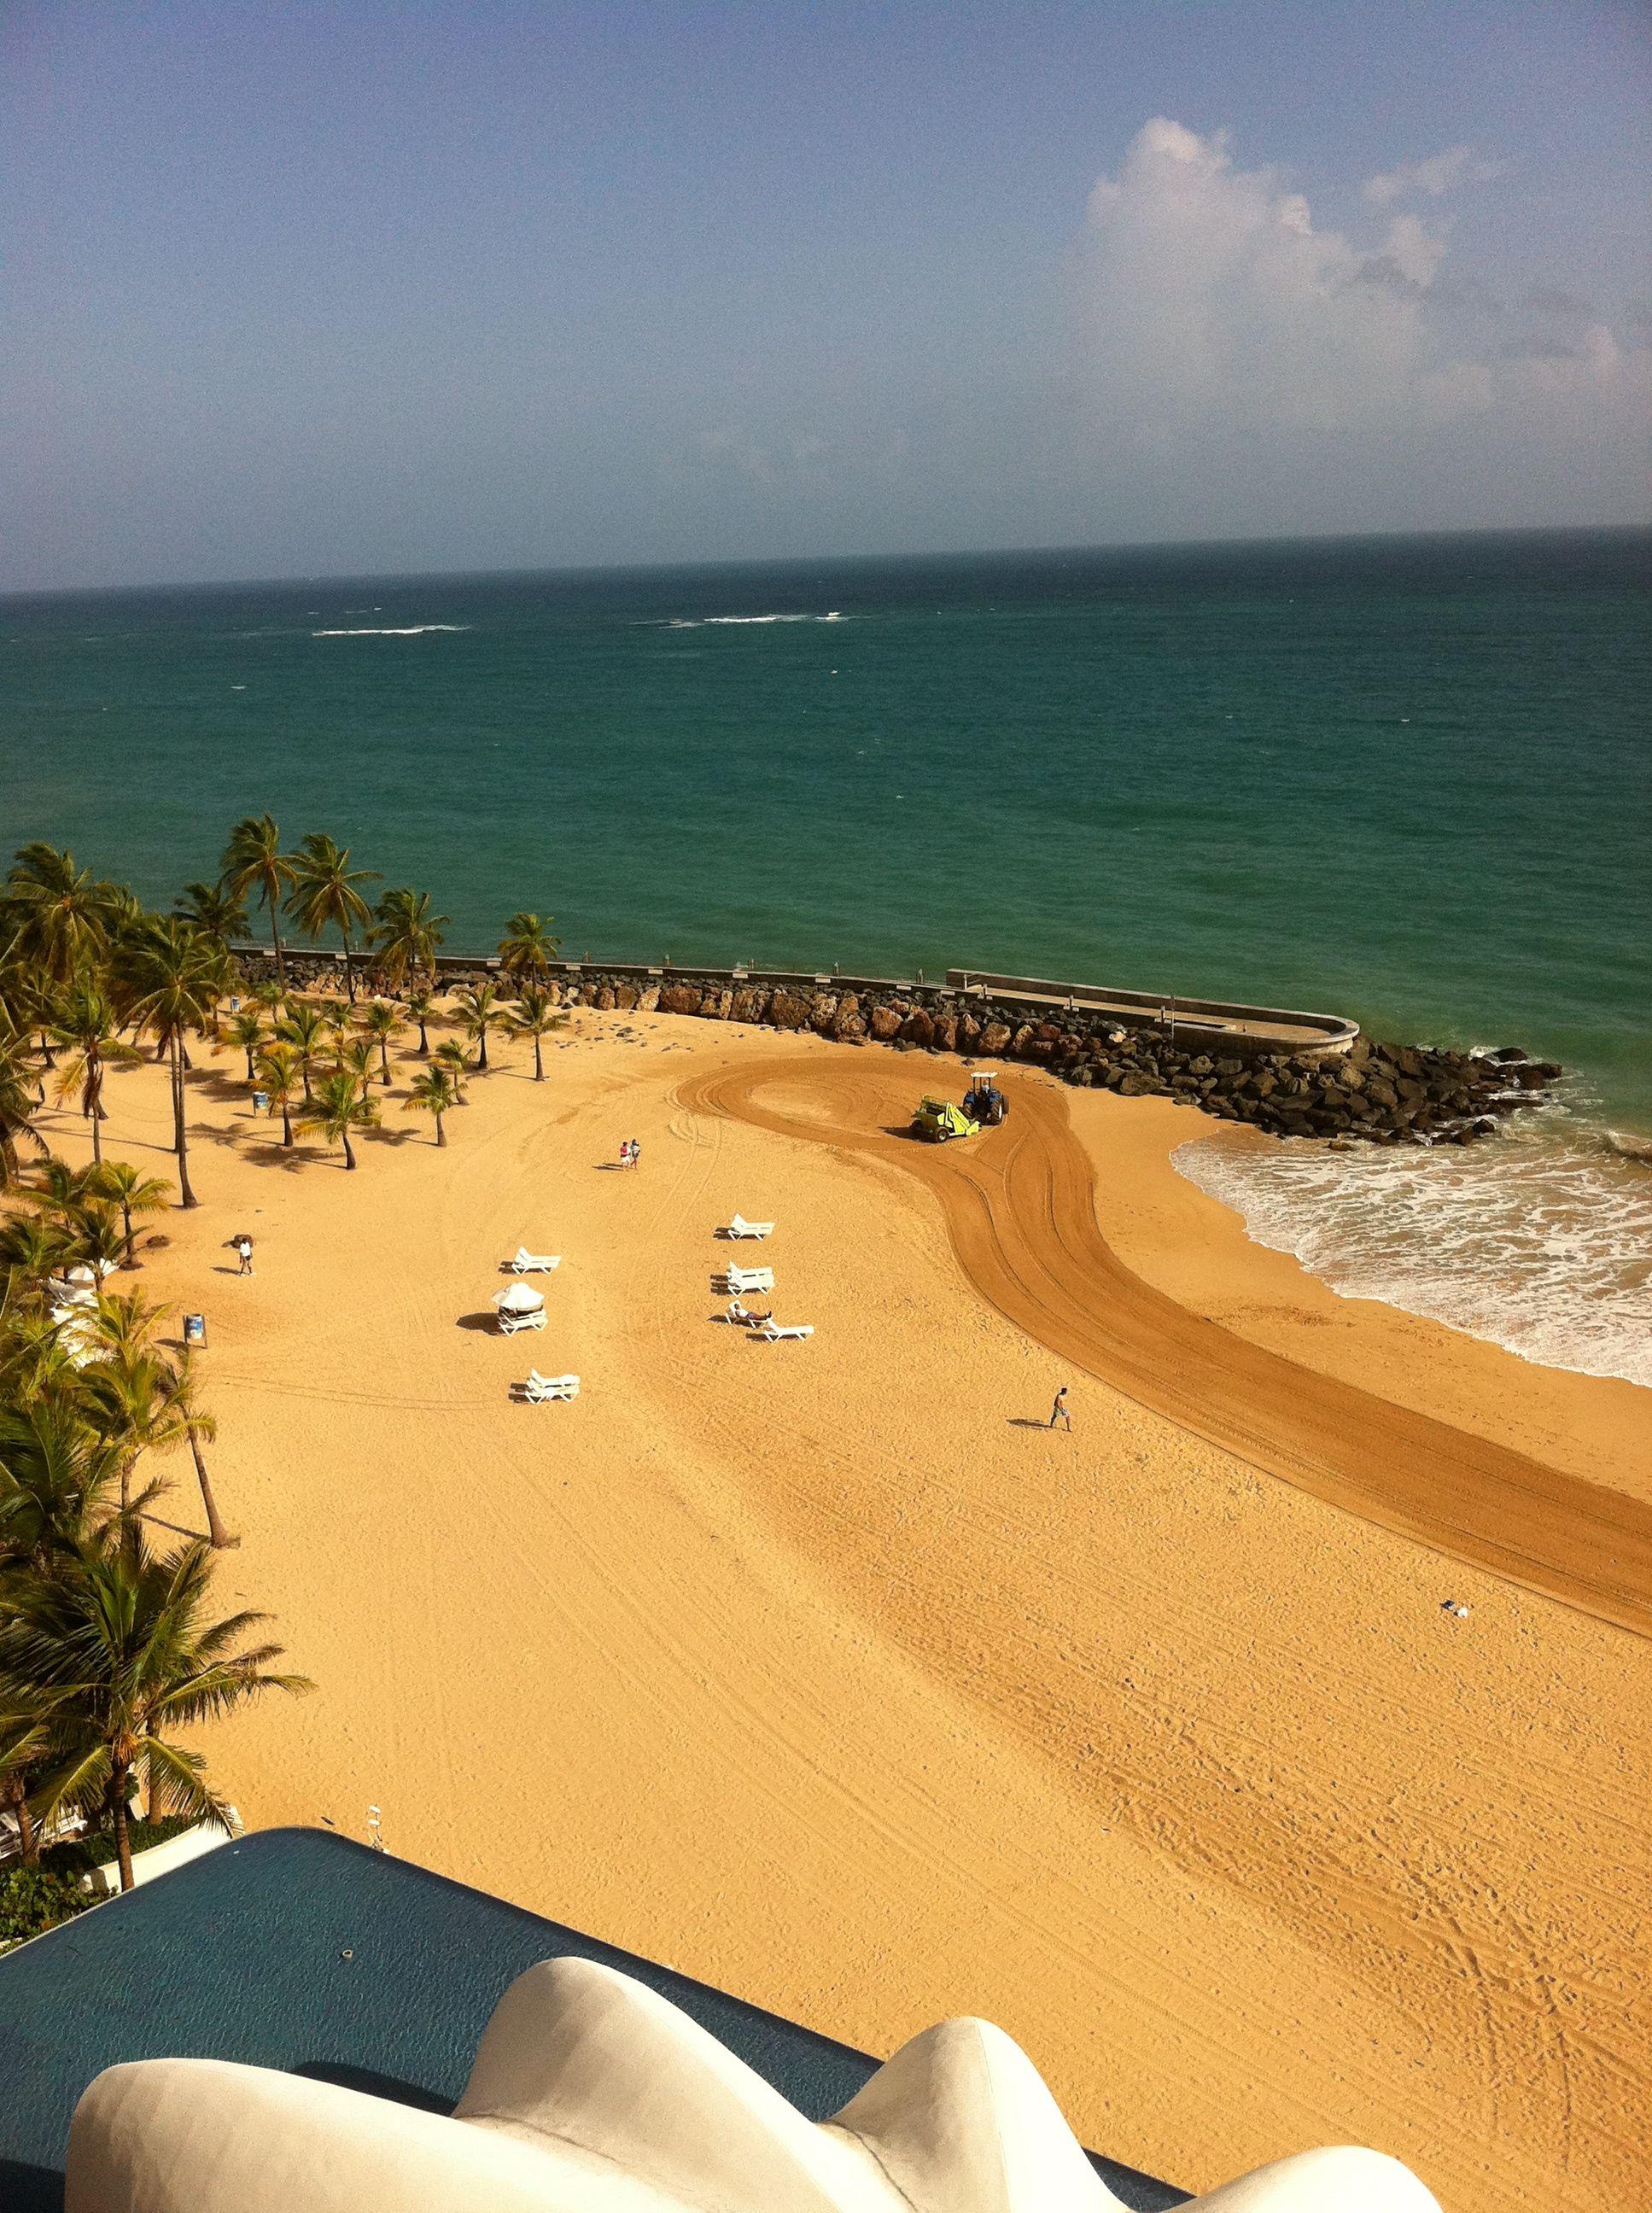 San juan puerto rico beach vacation ideas pinterest for Puerto rico vacation ideas